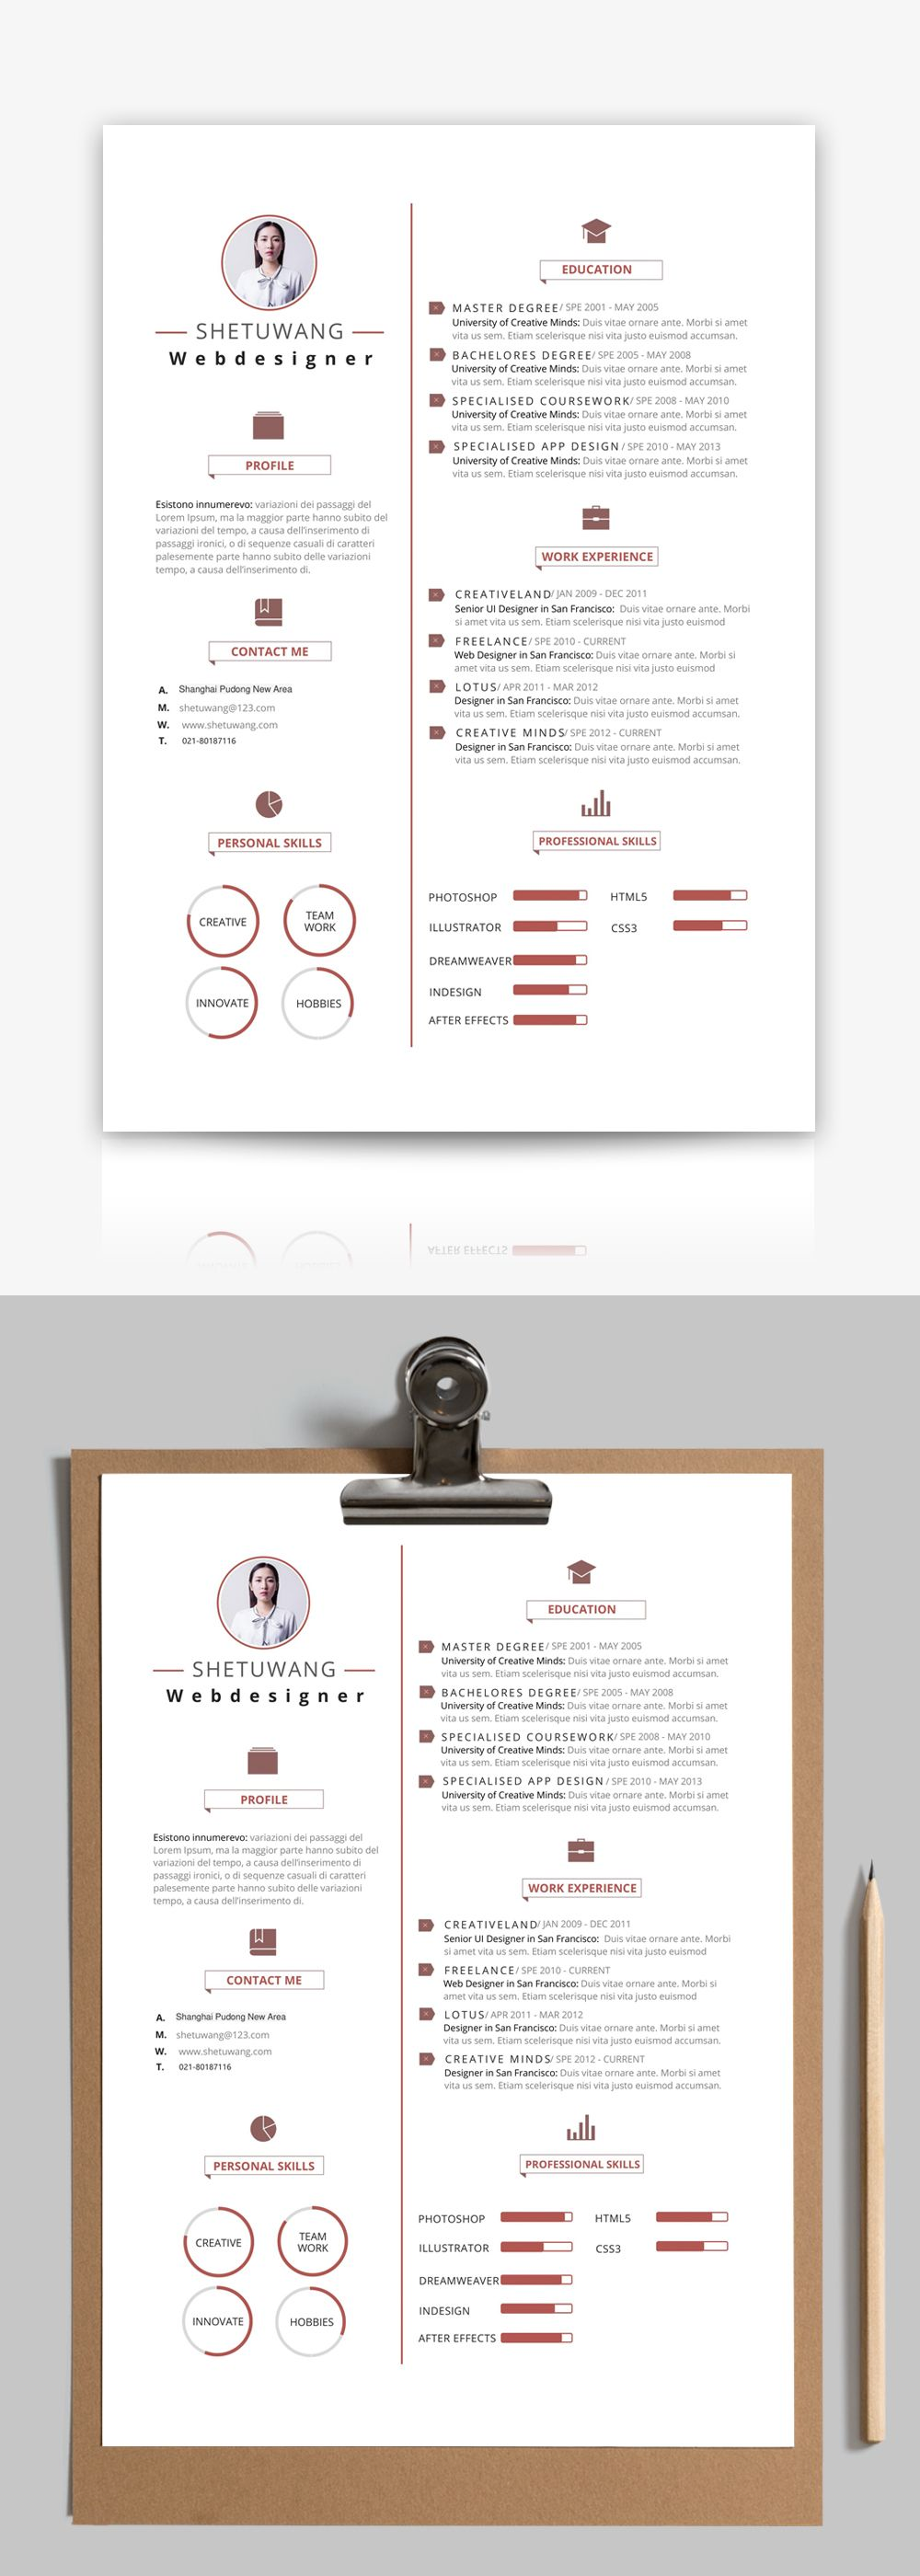 english resume template Resume, Templates, Personal resume